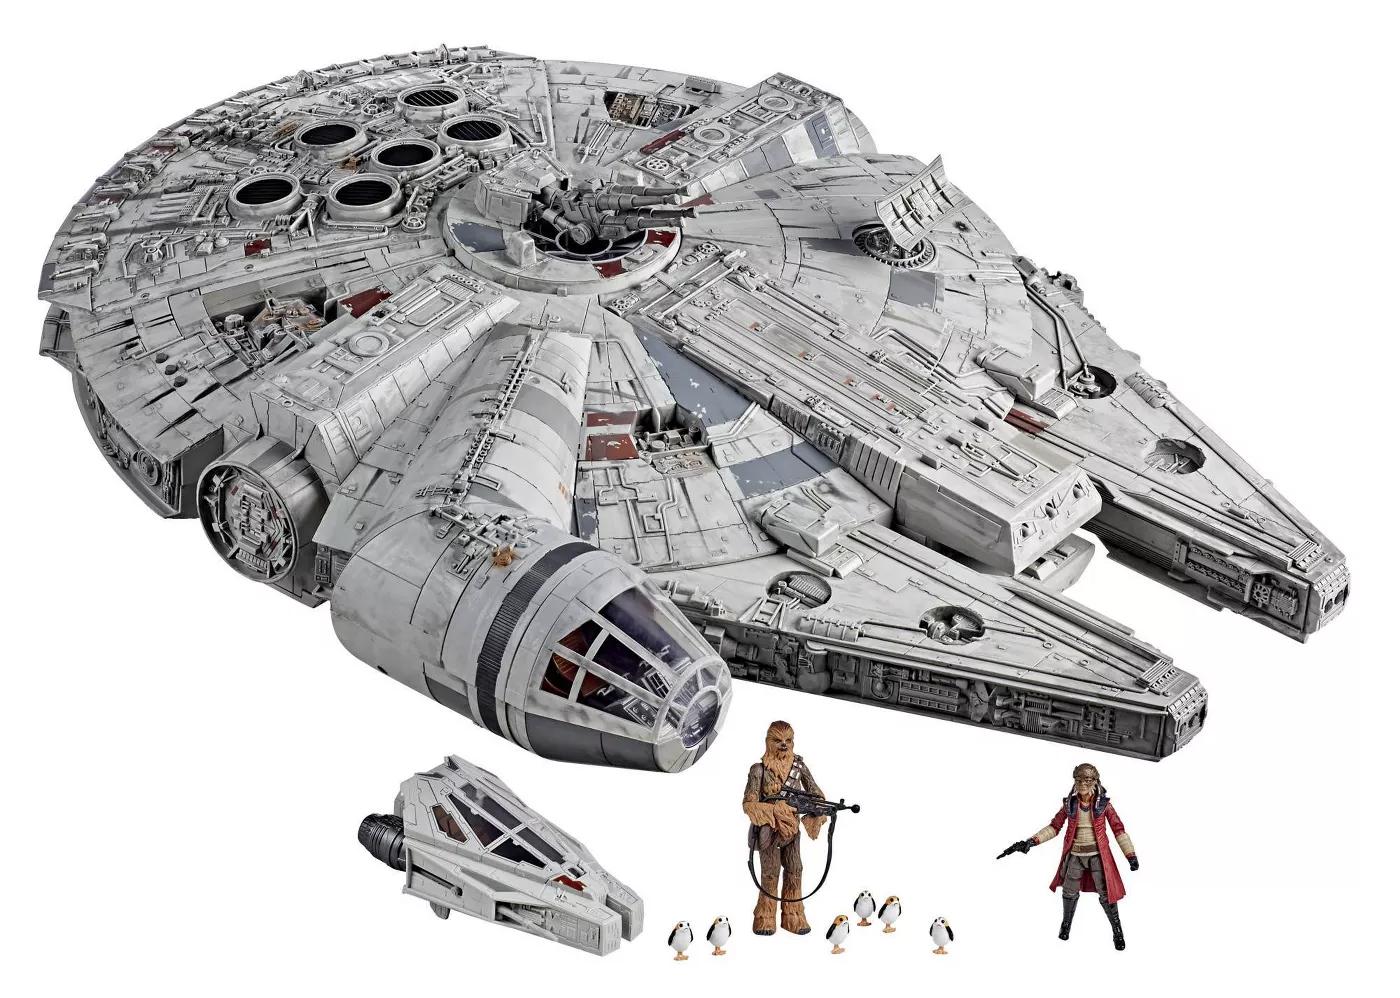 Star Wars The Vintage Collection Galaxy's Edge Millennium Falcon Smuggler's Run